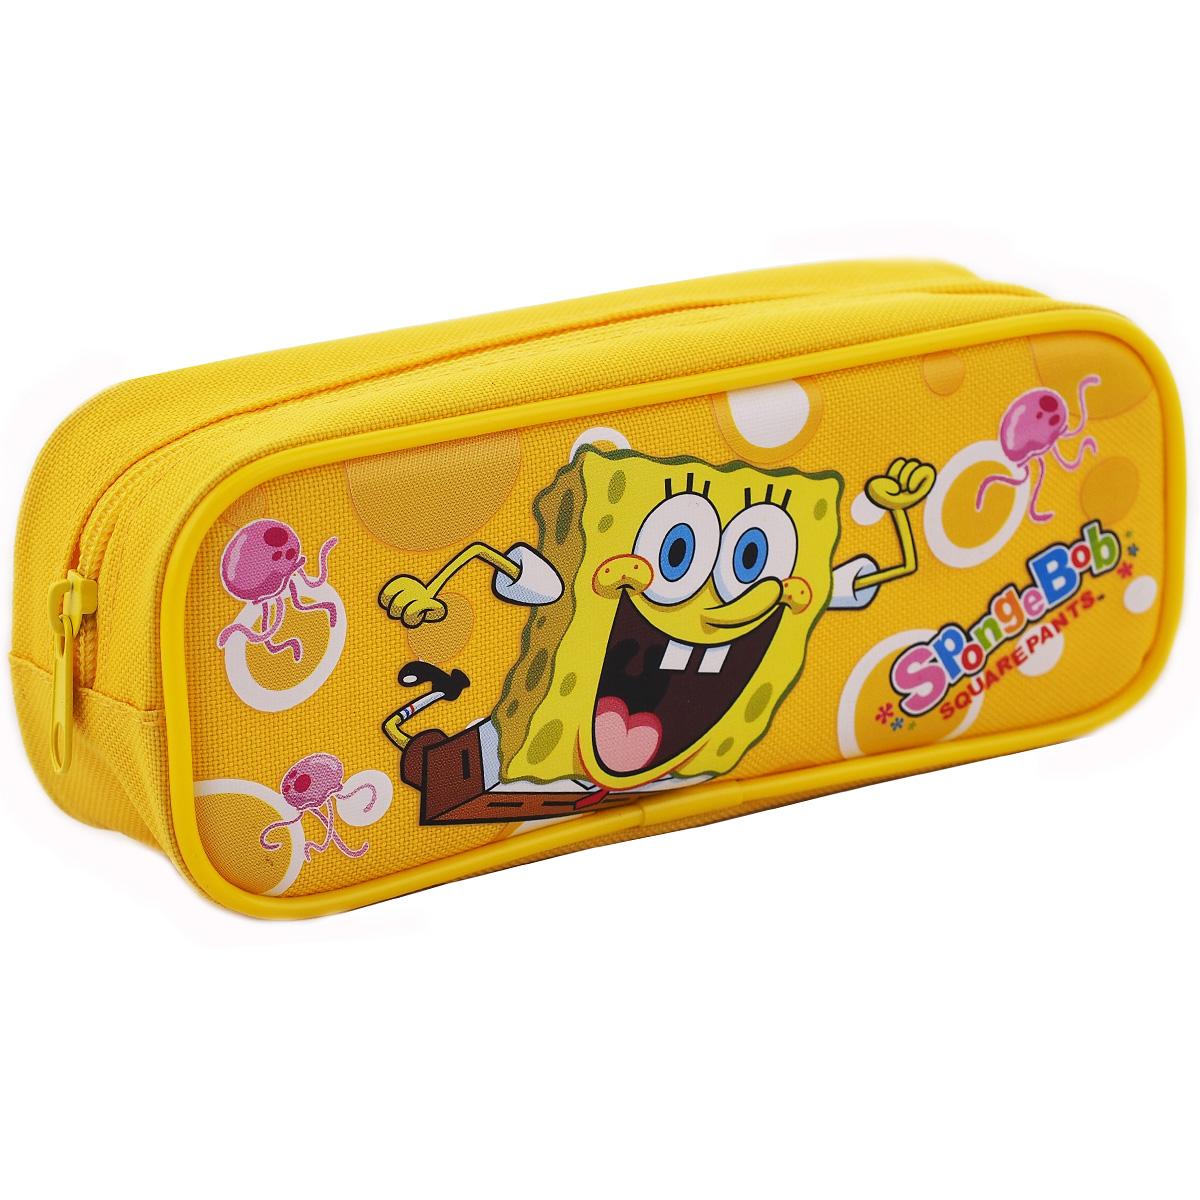 Spongebob Character Single Zipper Yellow Pencil Case